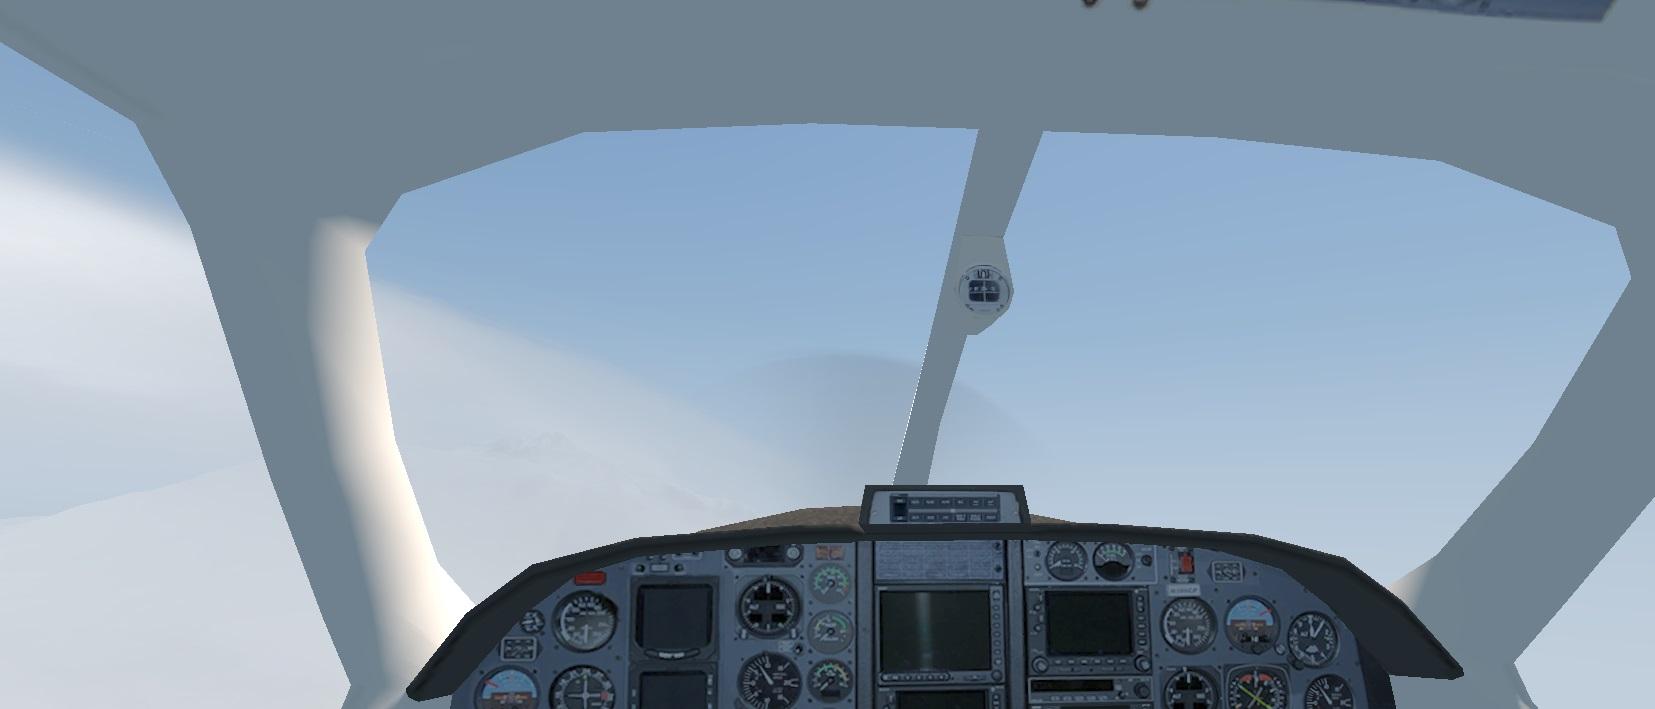 cloudsystem019.jpg